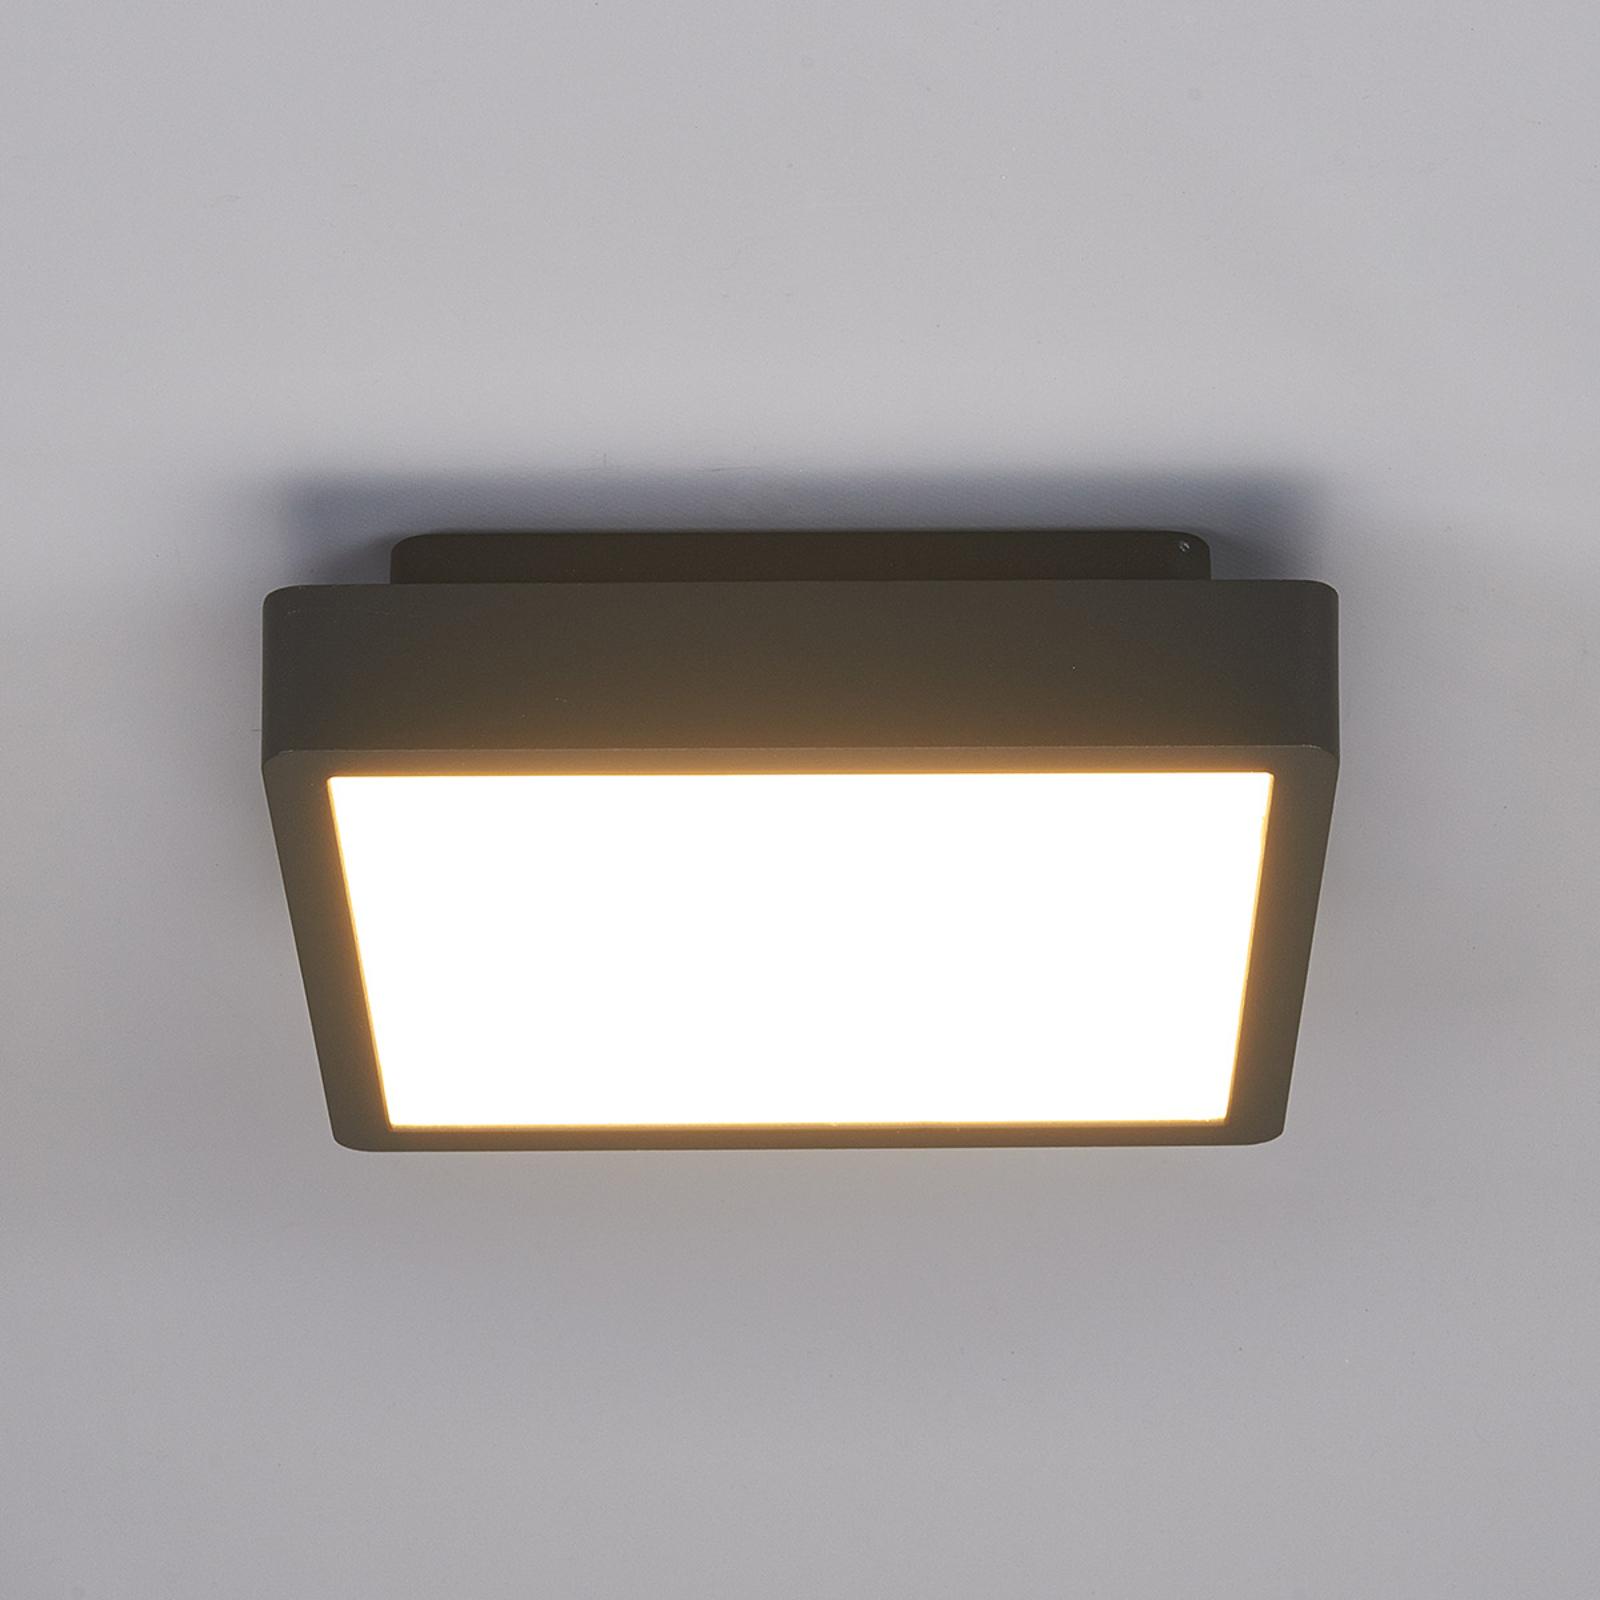 Prostokątna zewnętrzna lampa sufitowa LED Talea